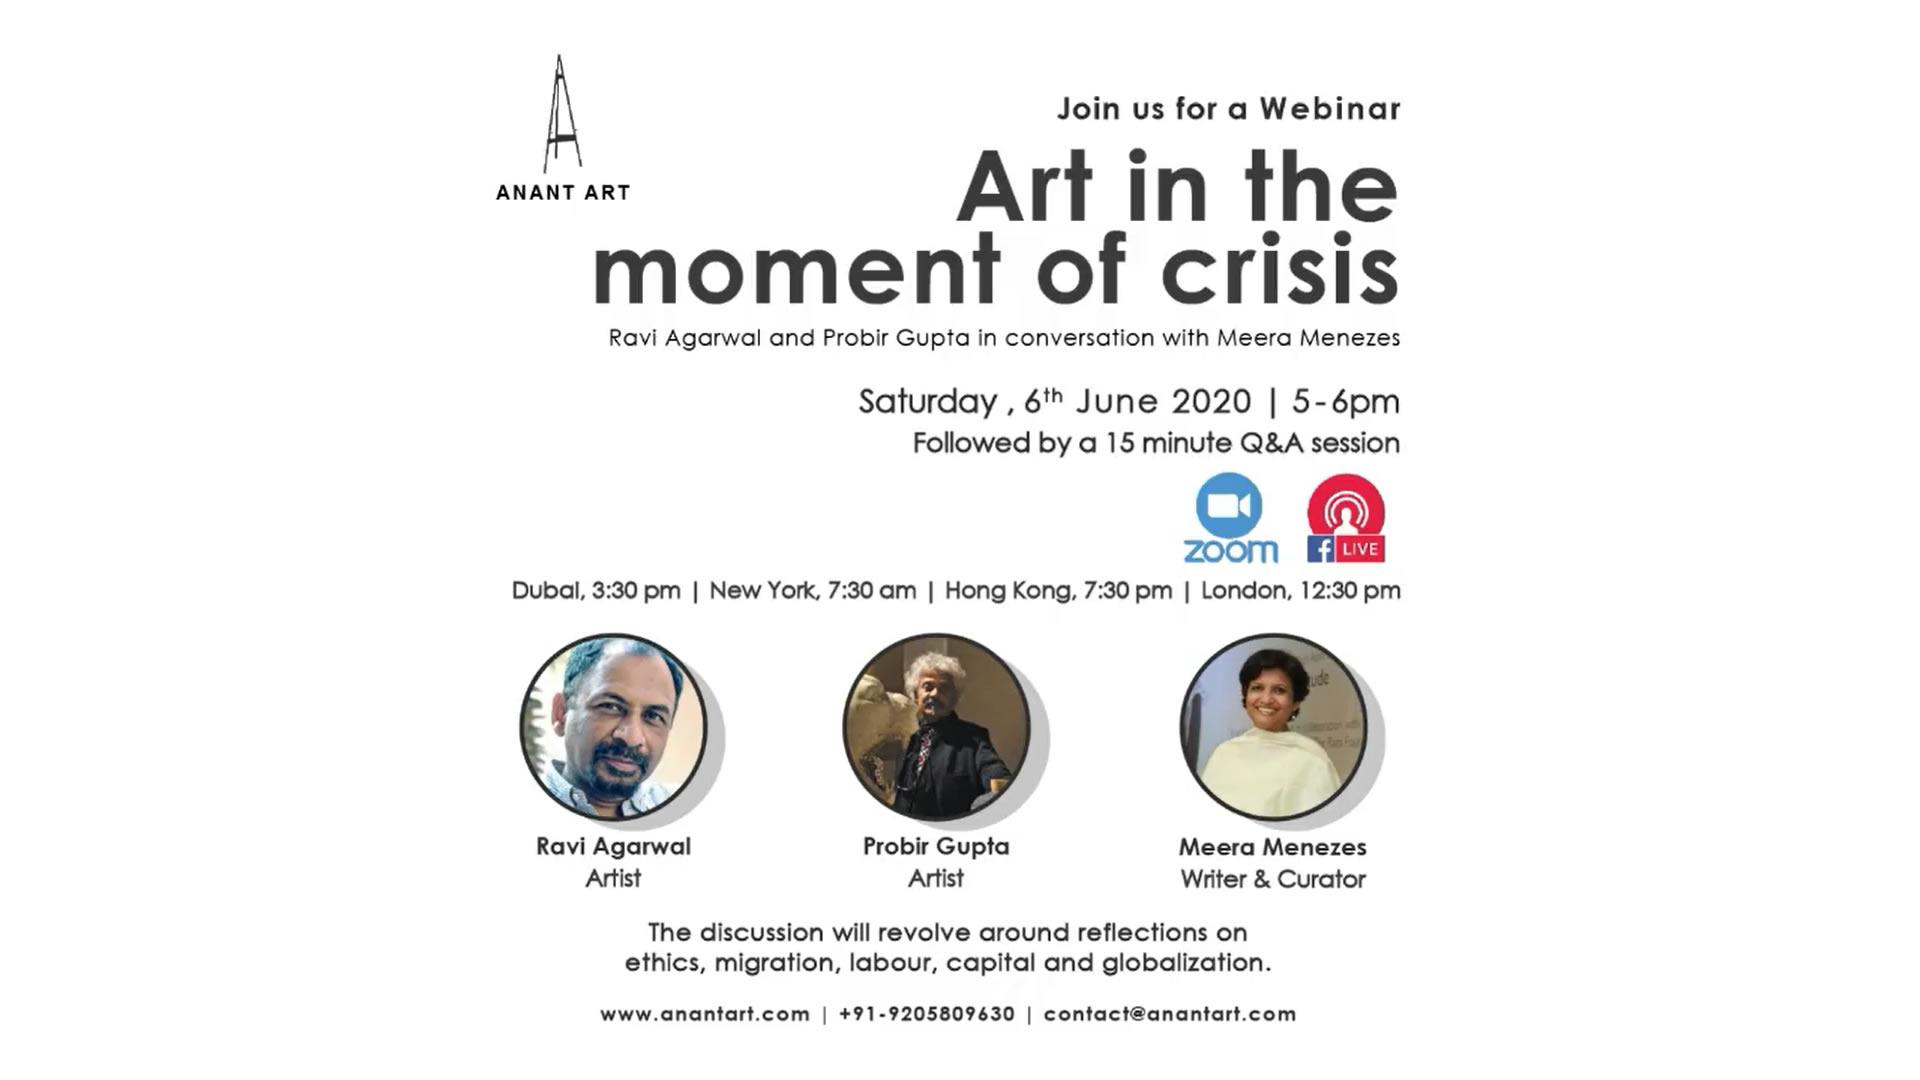 Anant Art Webinar: Art in the moment of crisis